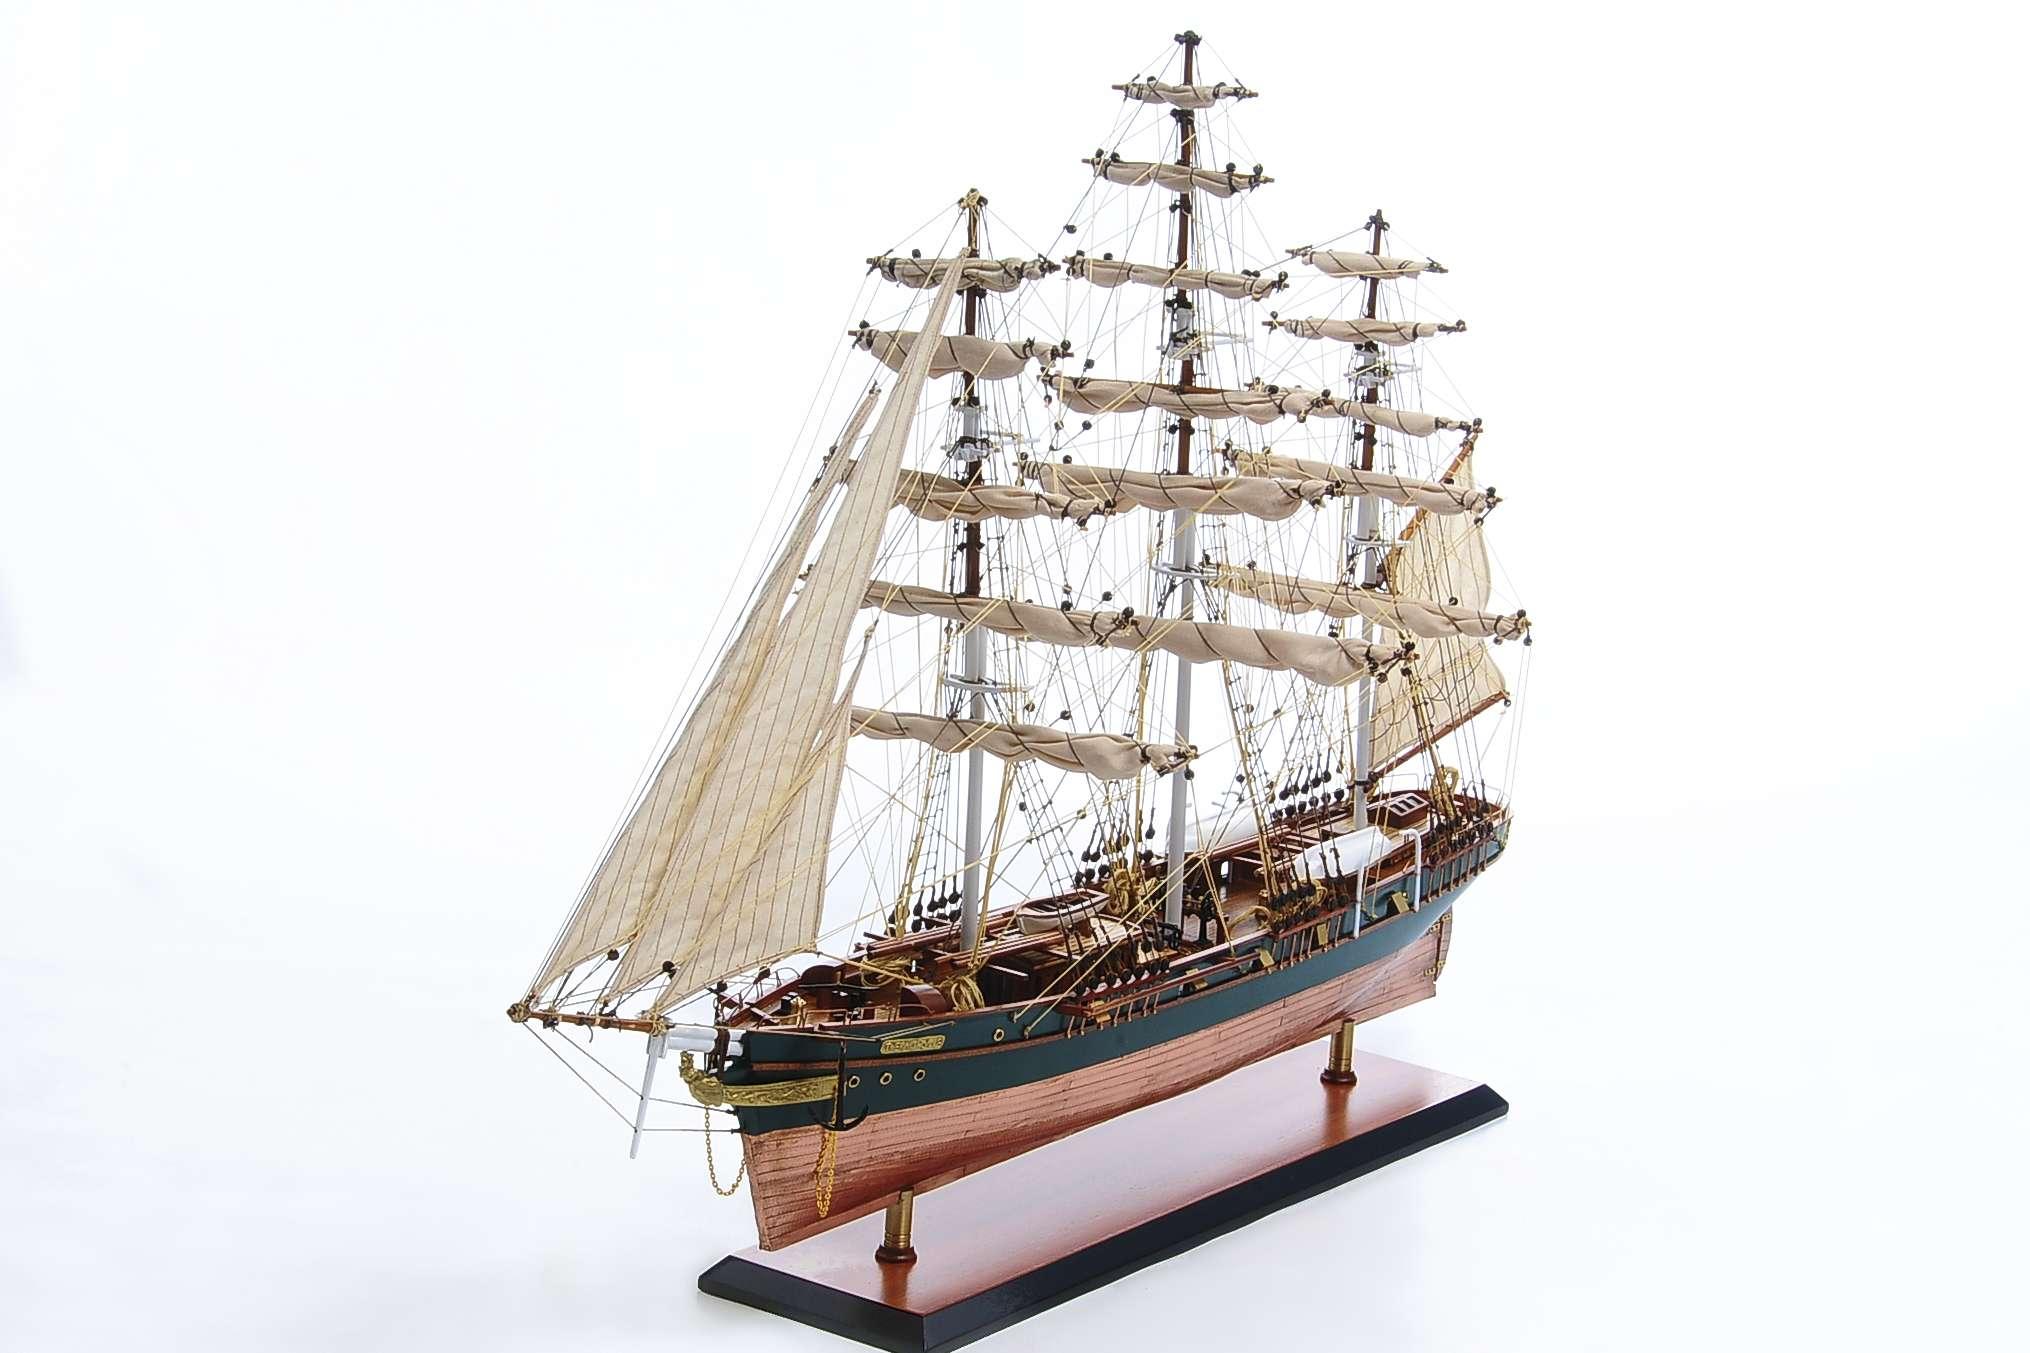 1434-4858-Thermopylae-Model-Boat